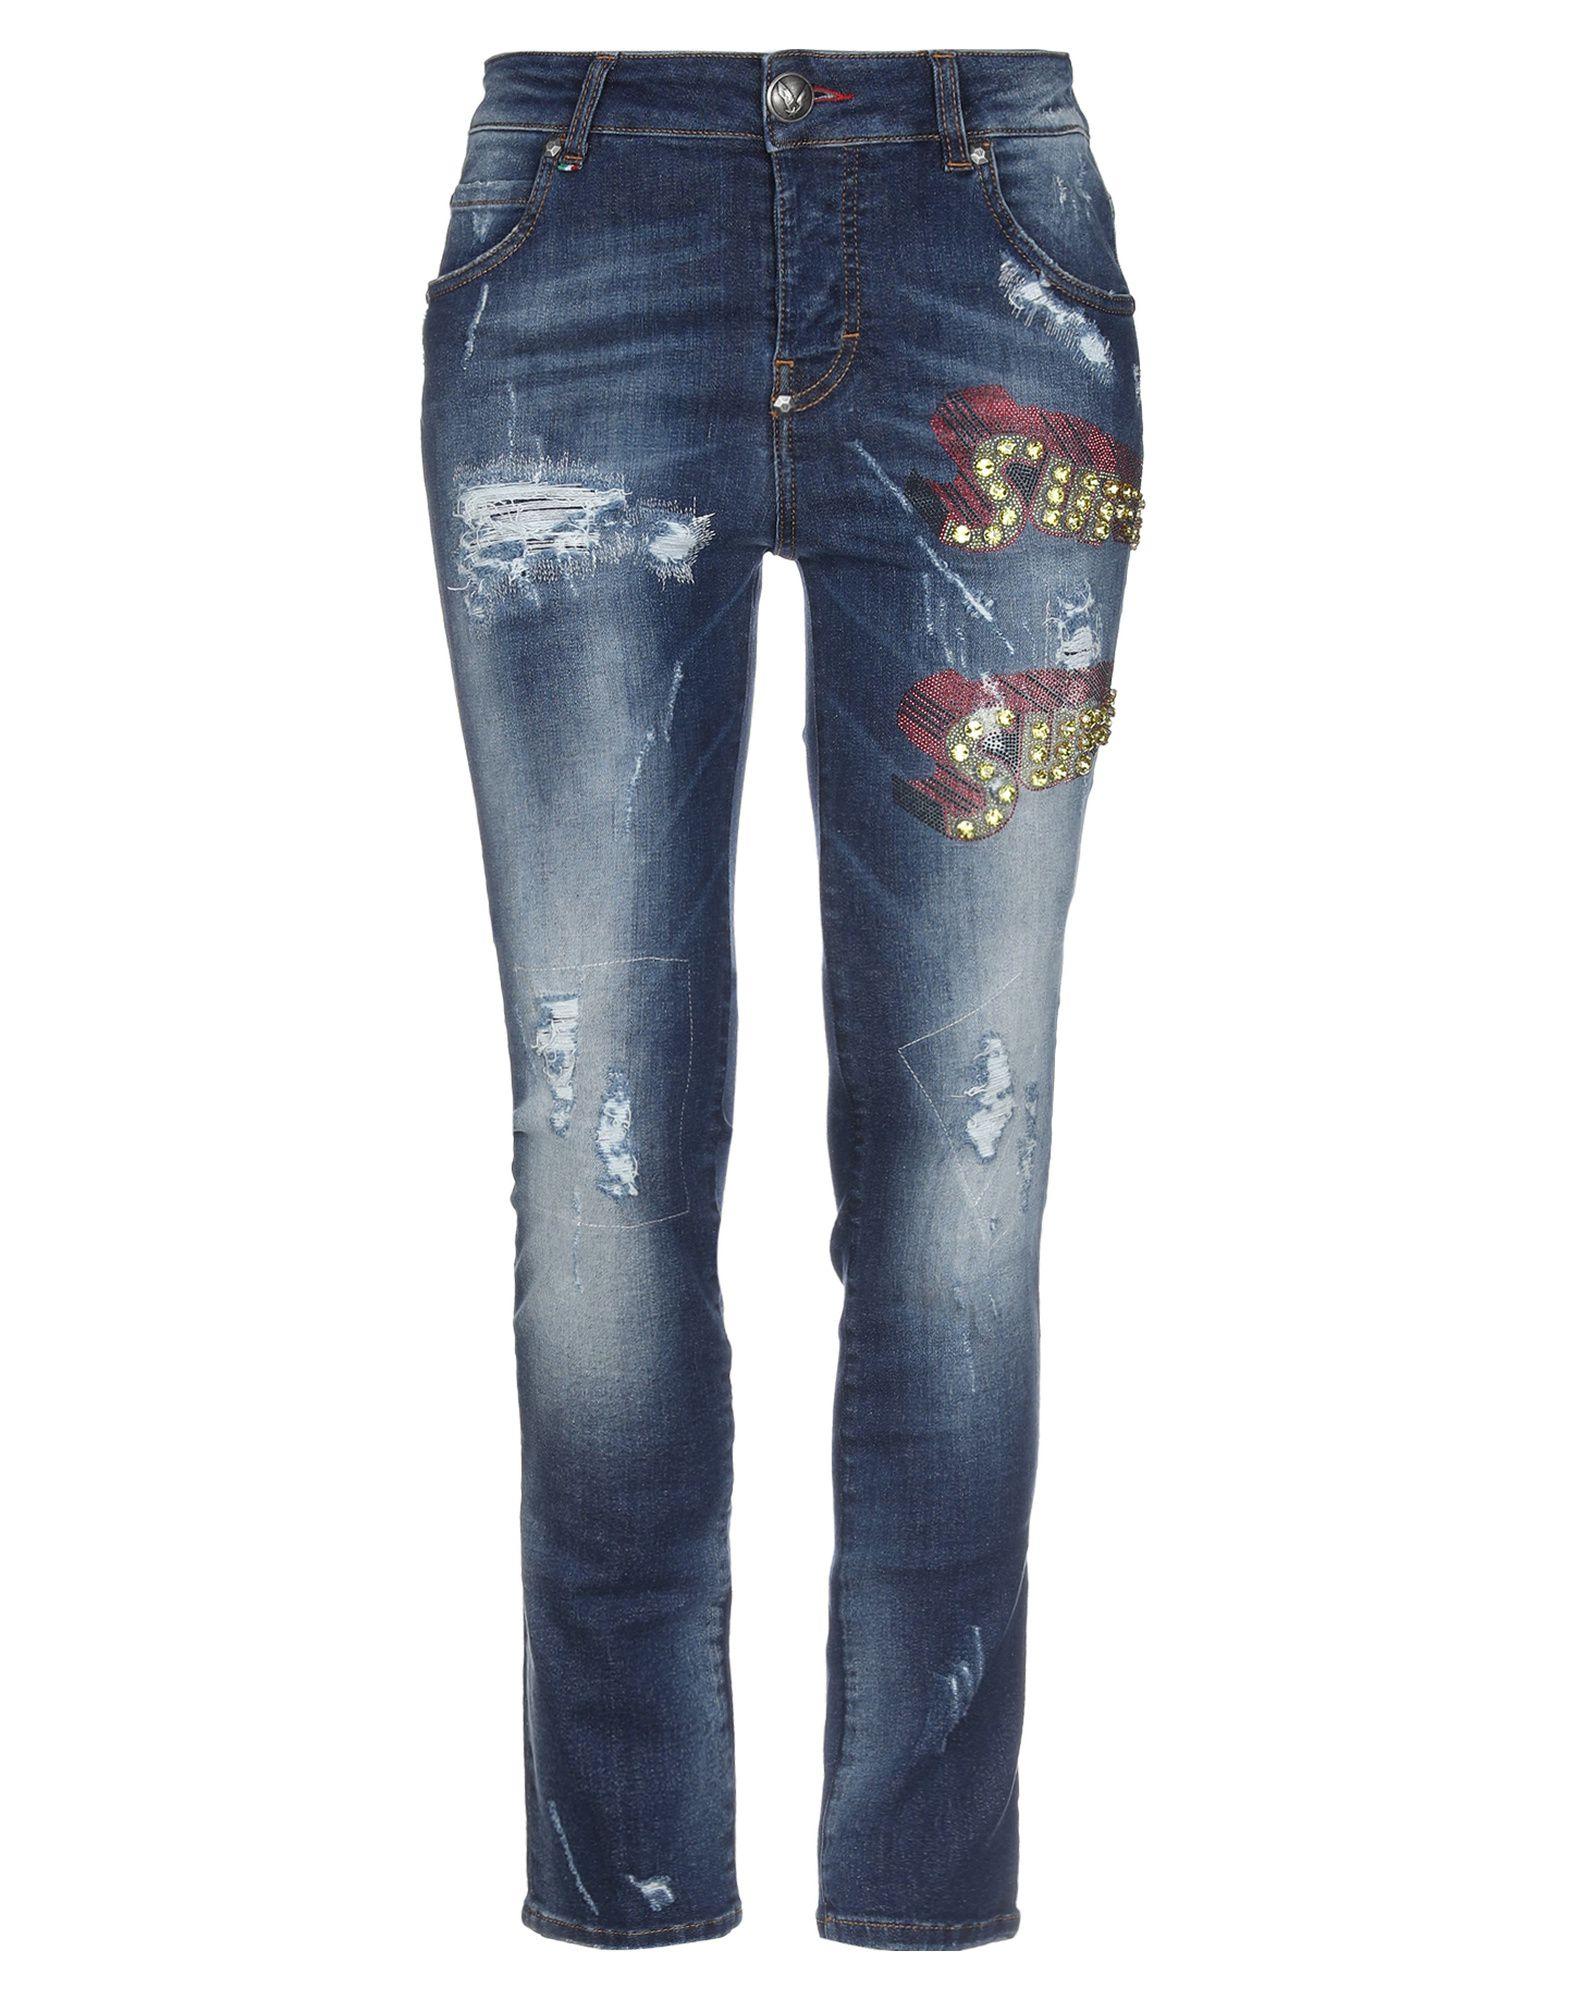 Pantaloni Jeans Philipp Plein donna - 42738940IU 42738940IU  preiswert kaufen